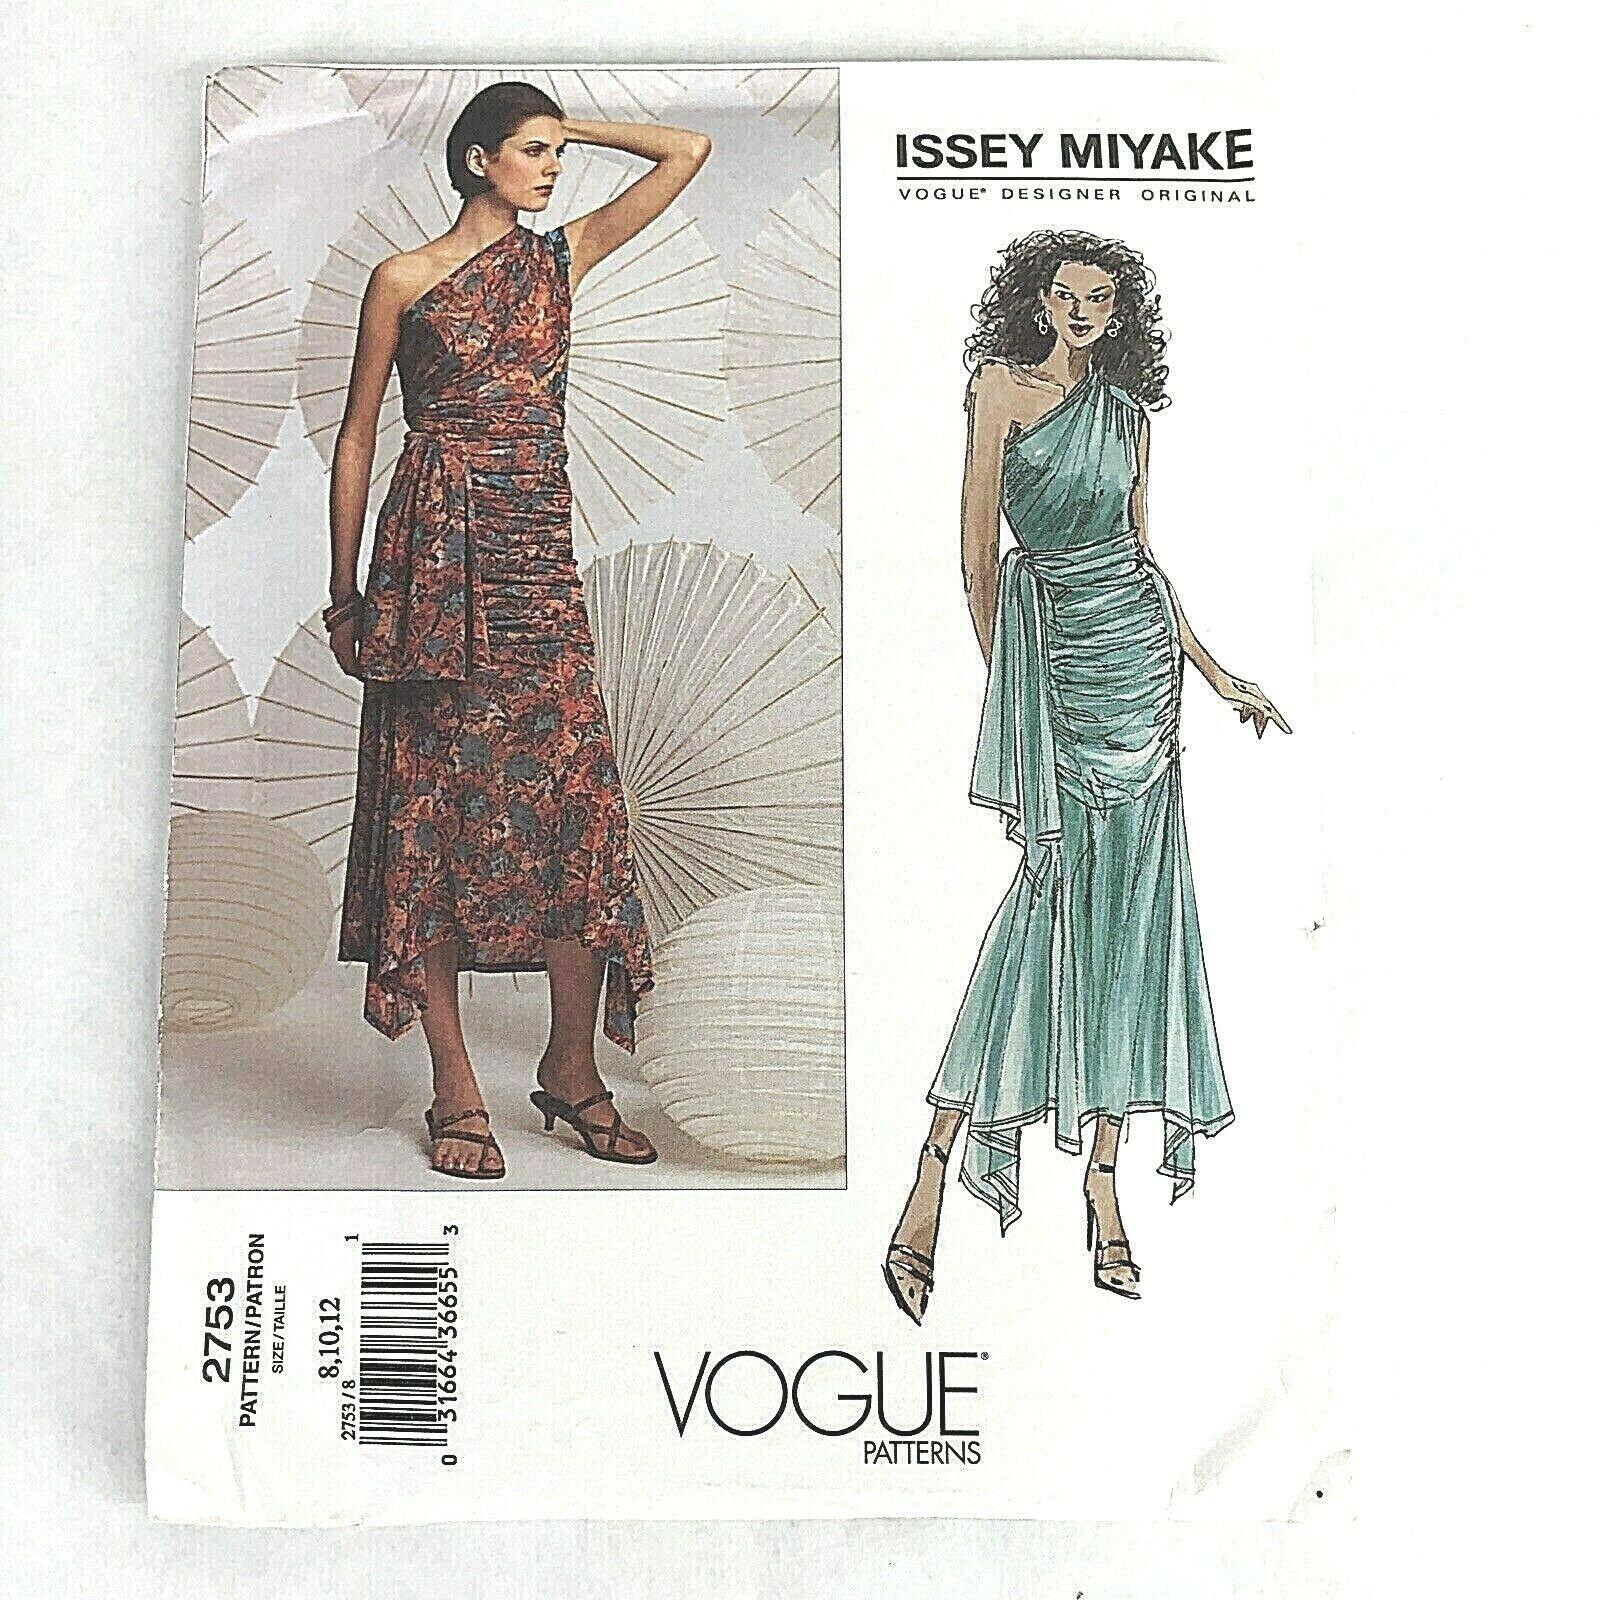 Issey Miyake Designer Original Vogue 2753 Pattern Top Skirt Misses Size 8 10 12 - $41.53